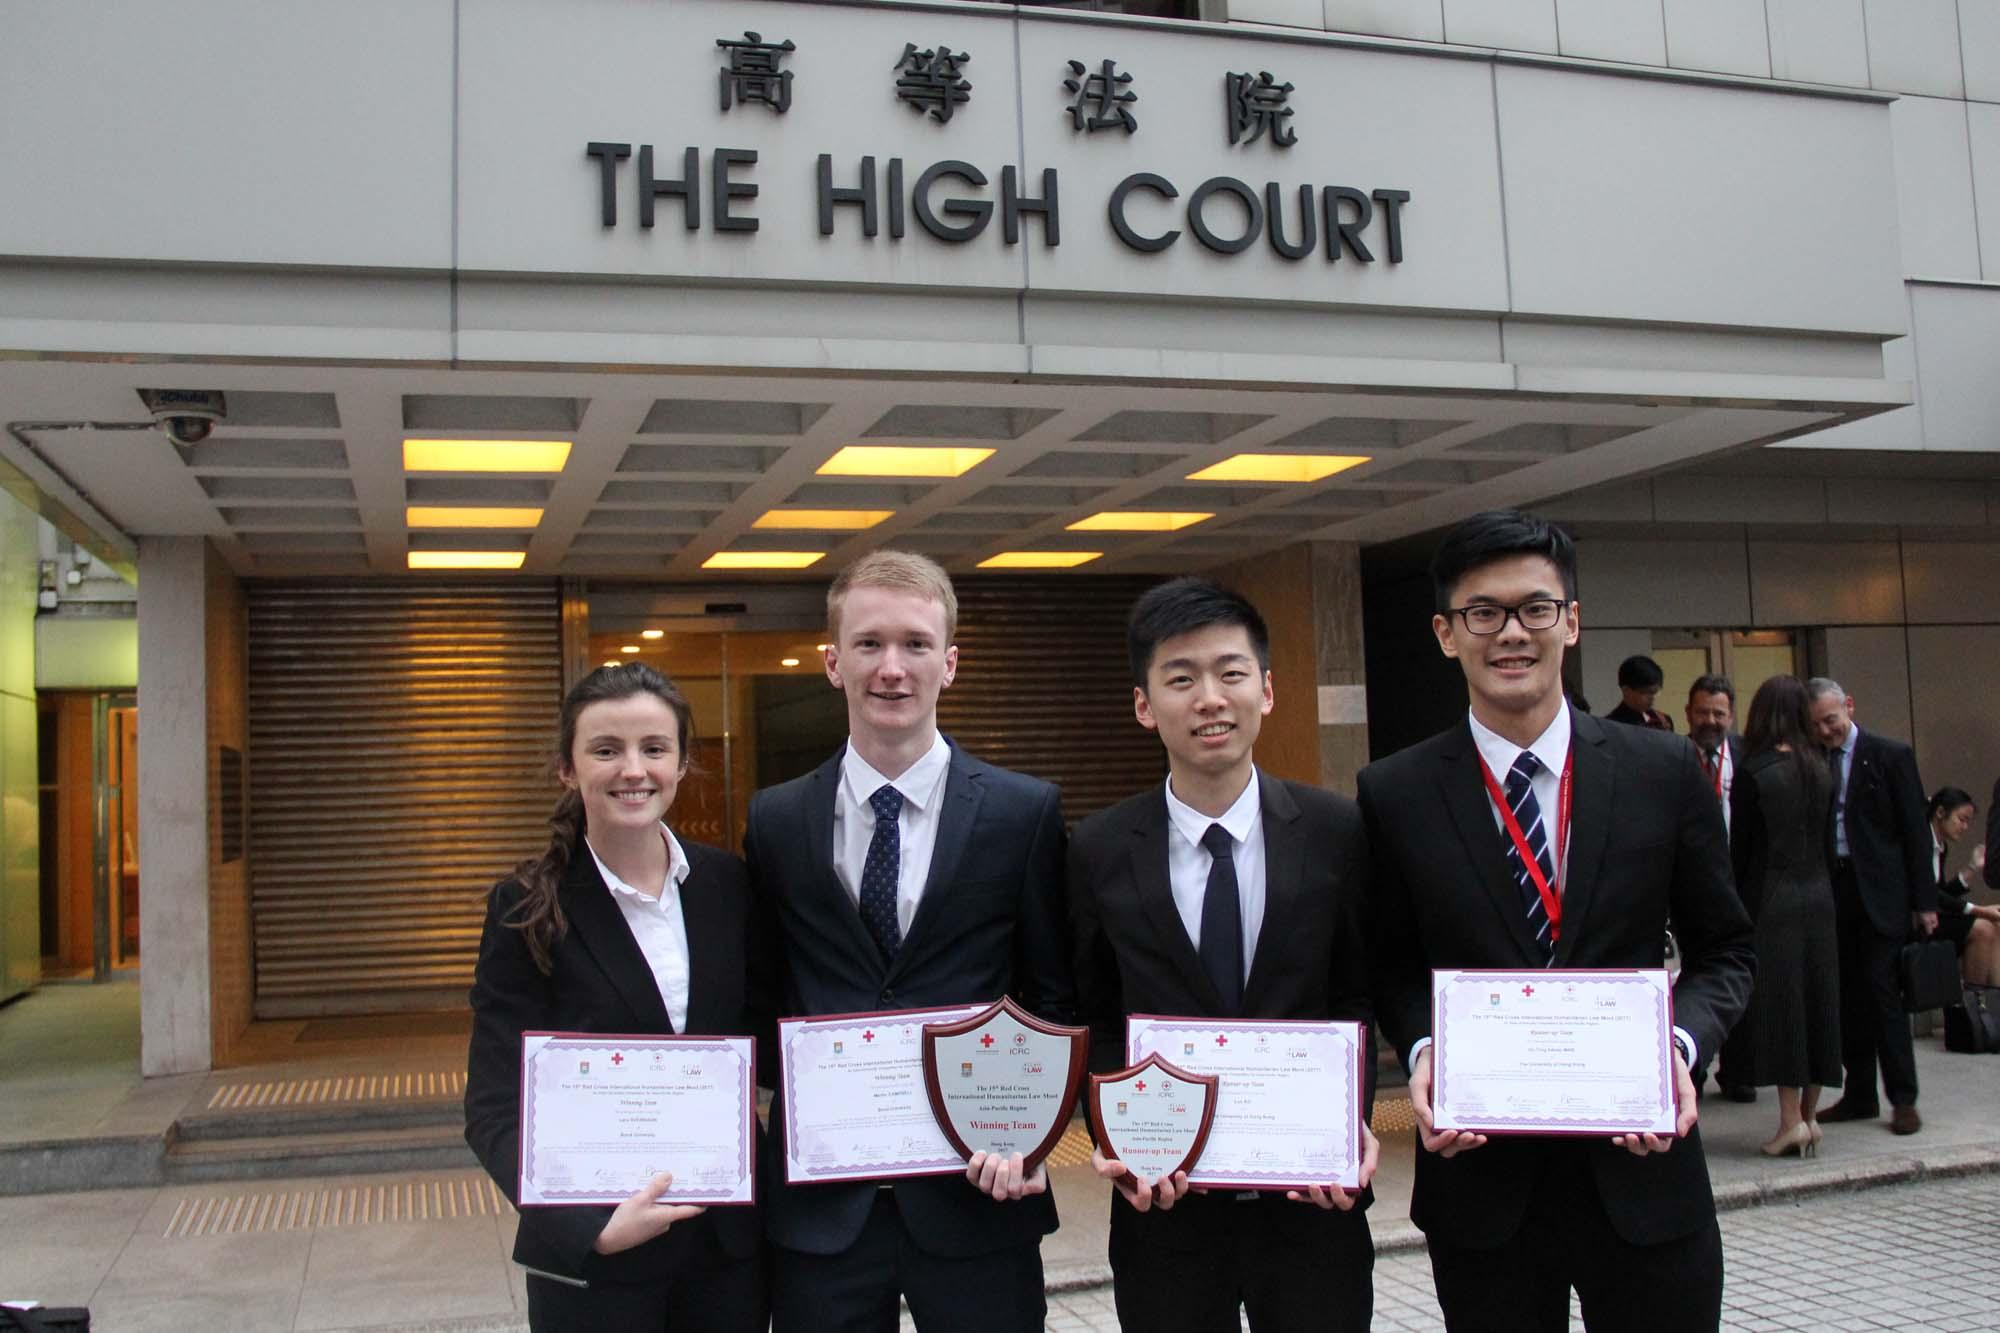 China: Bond University wins 15th Red Cross IHL Moot in Hong Kong